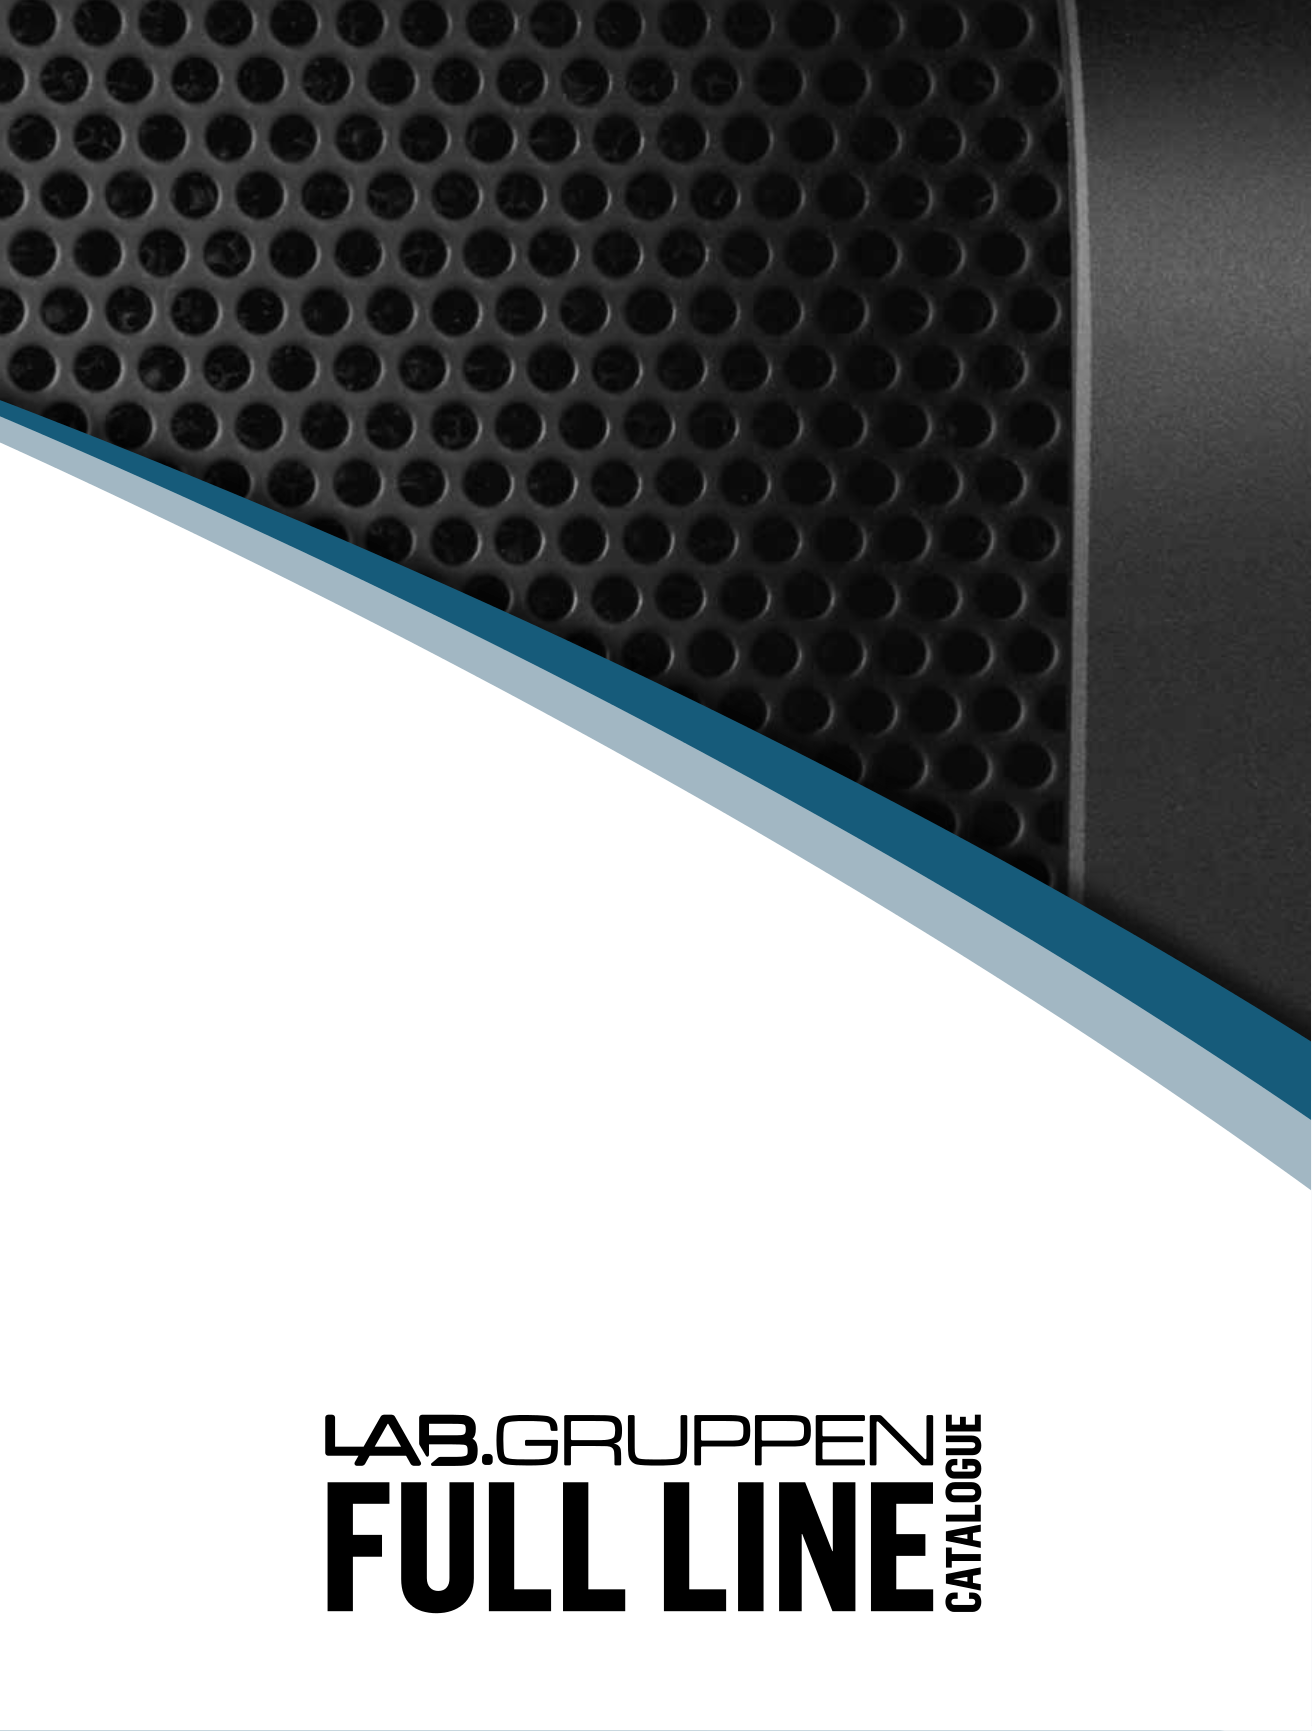 pdf for Lab.gruppen Amp LAB 1300C manual